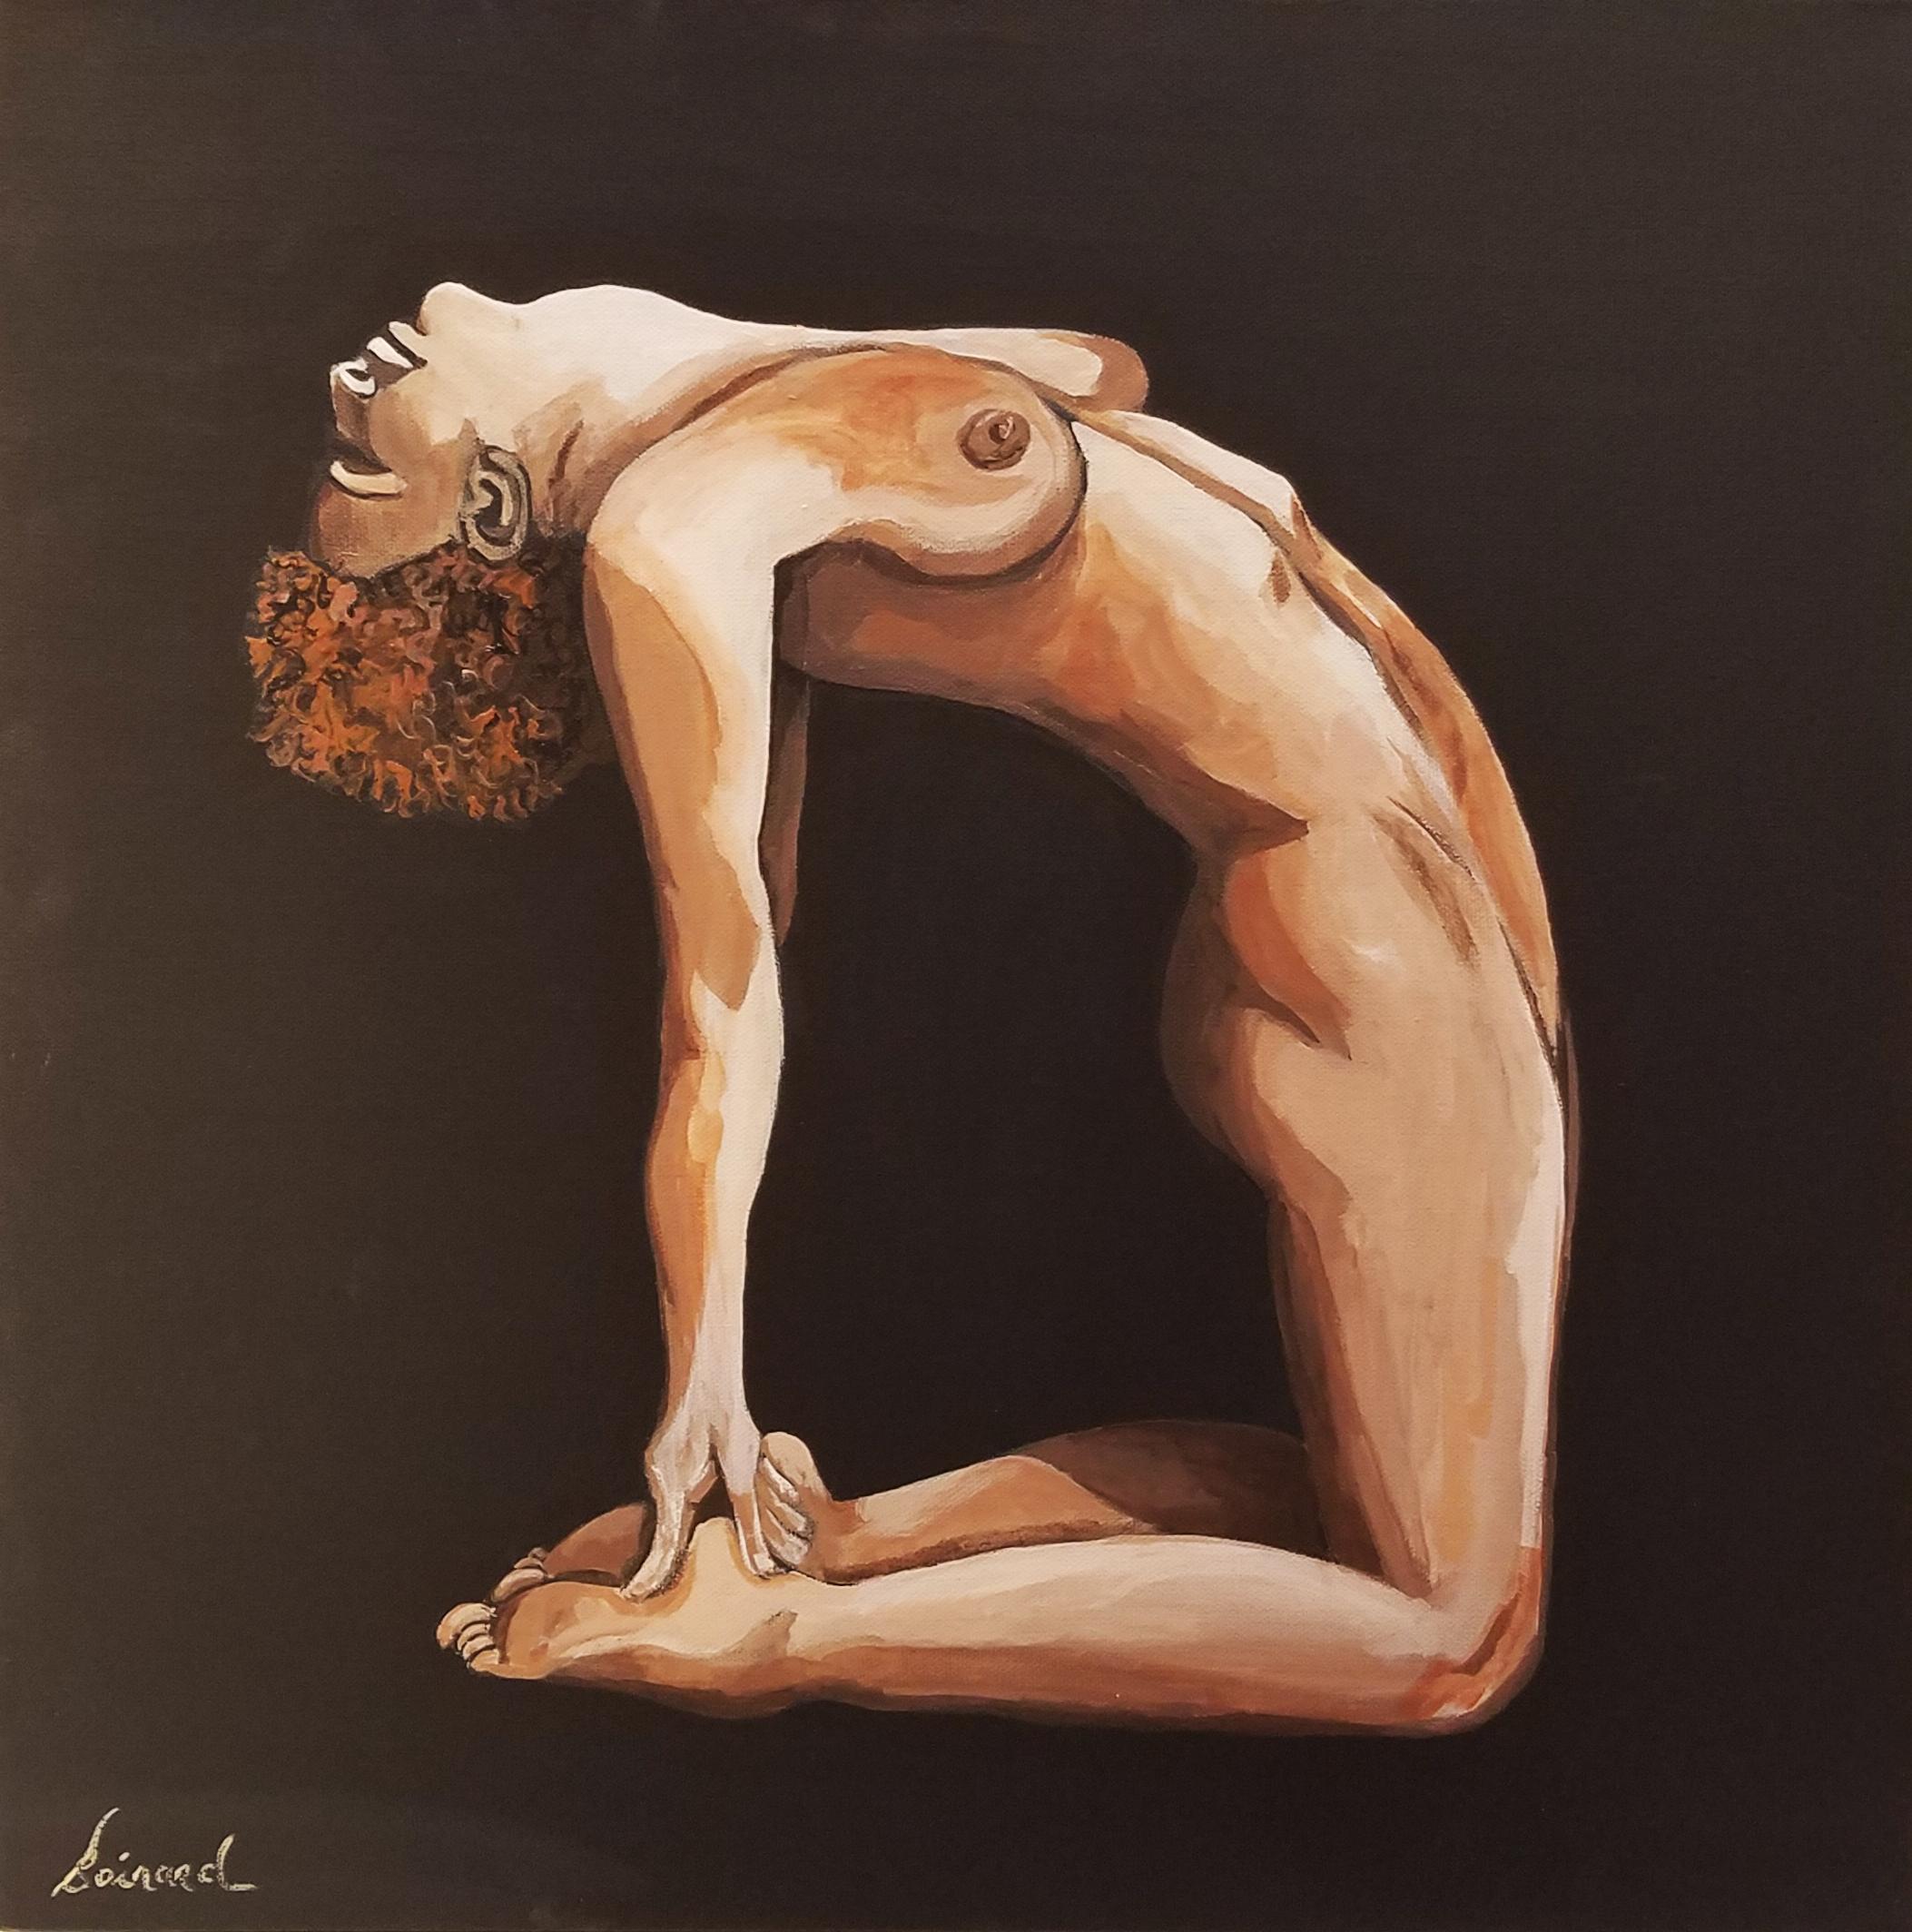 GalleryAWA-Tara Boirard-Detire.jpg